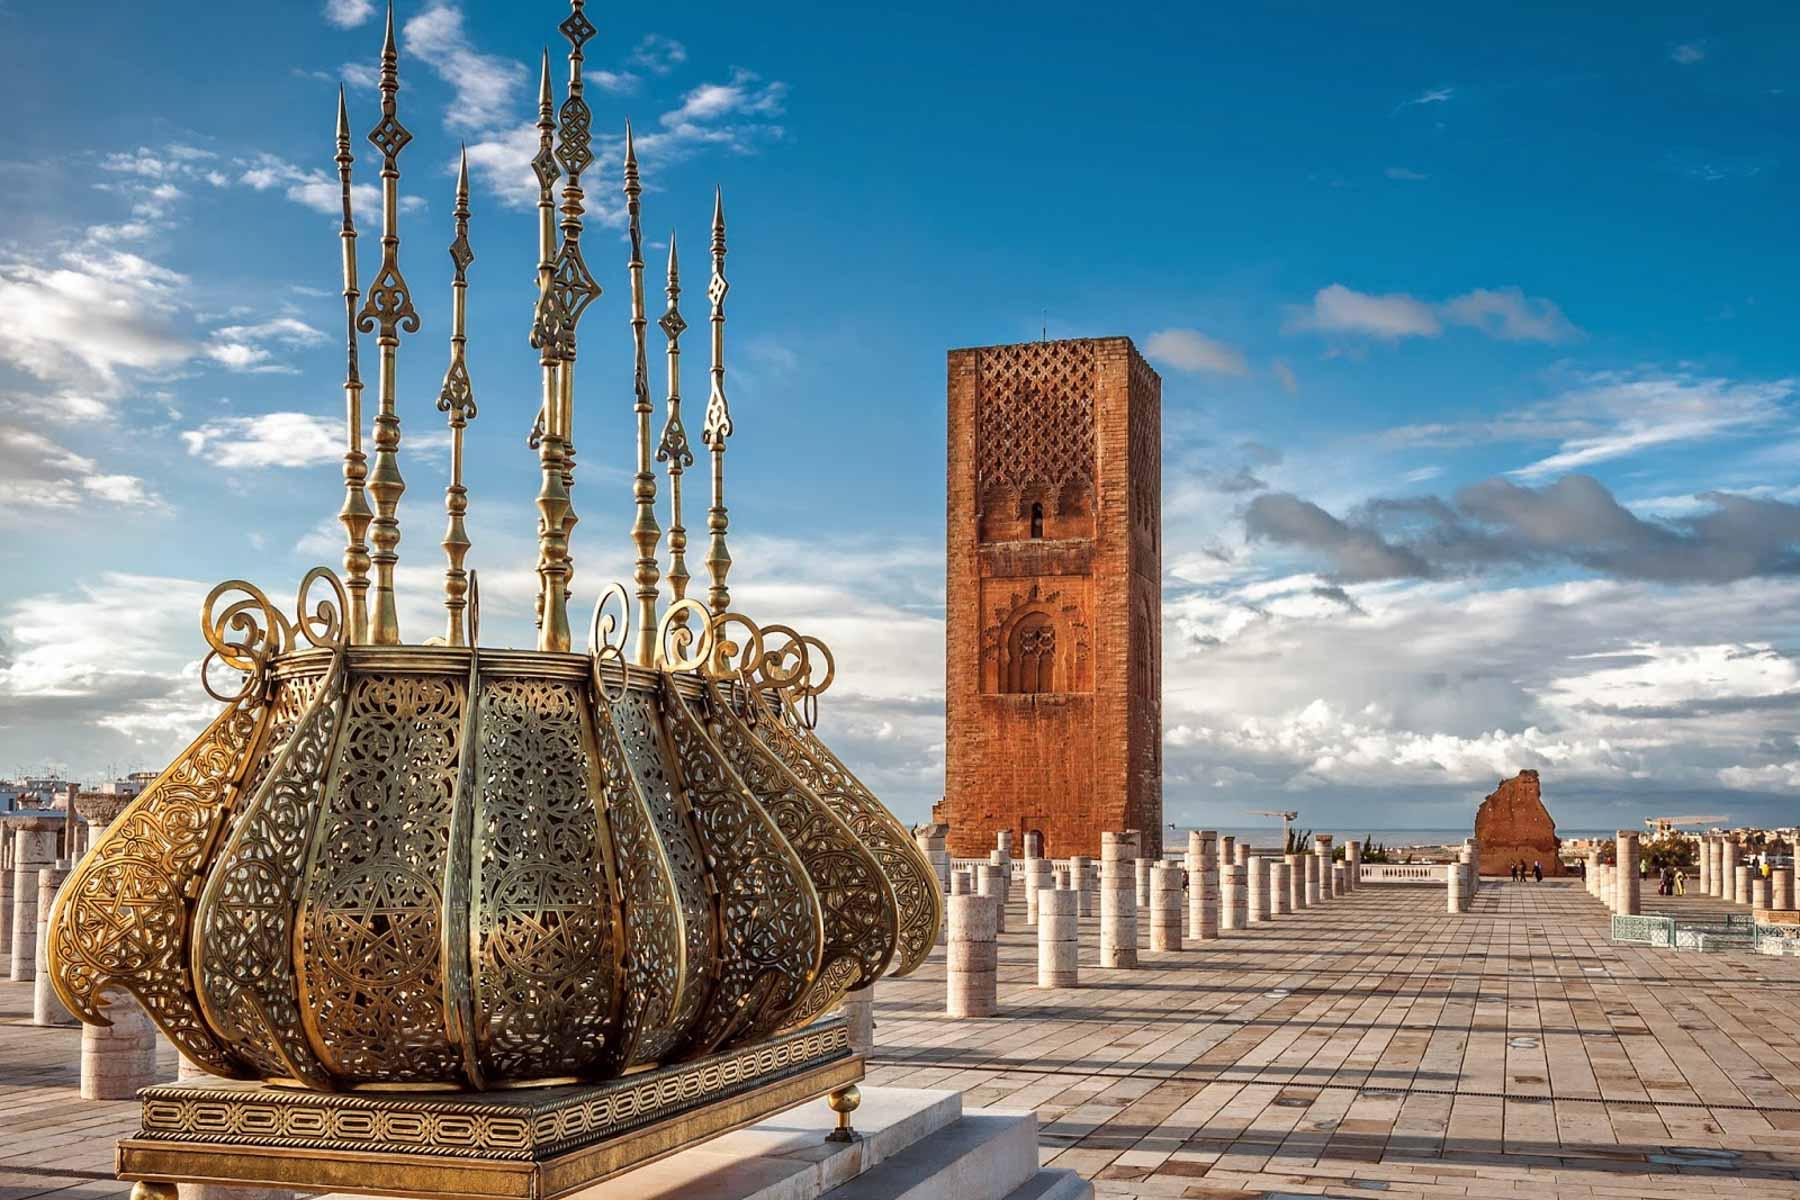 tour-hassan-rabat-maroc1.jpg